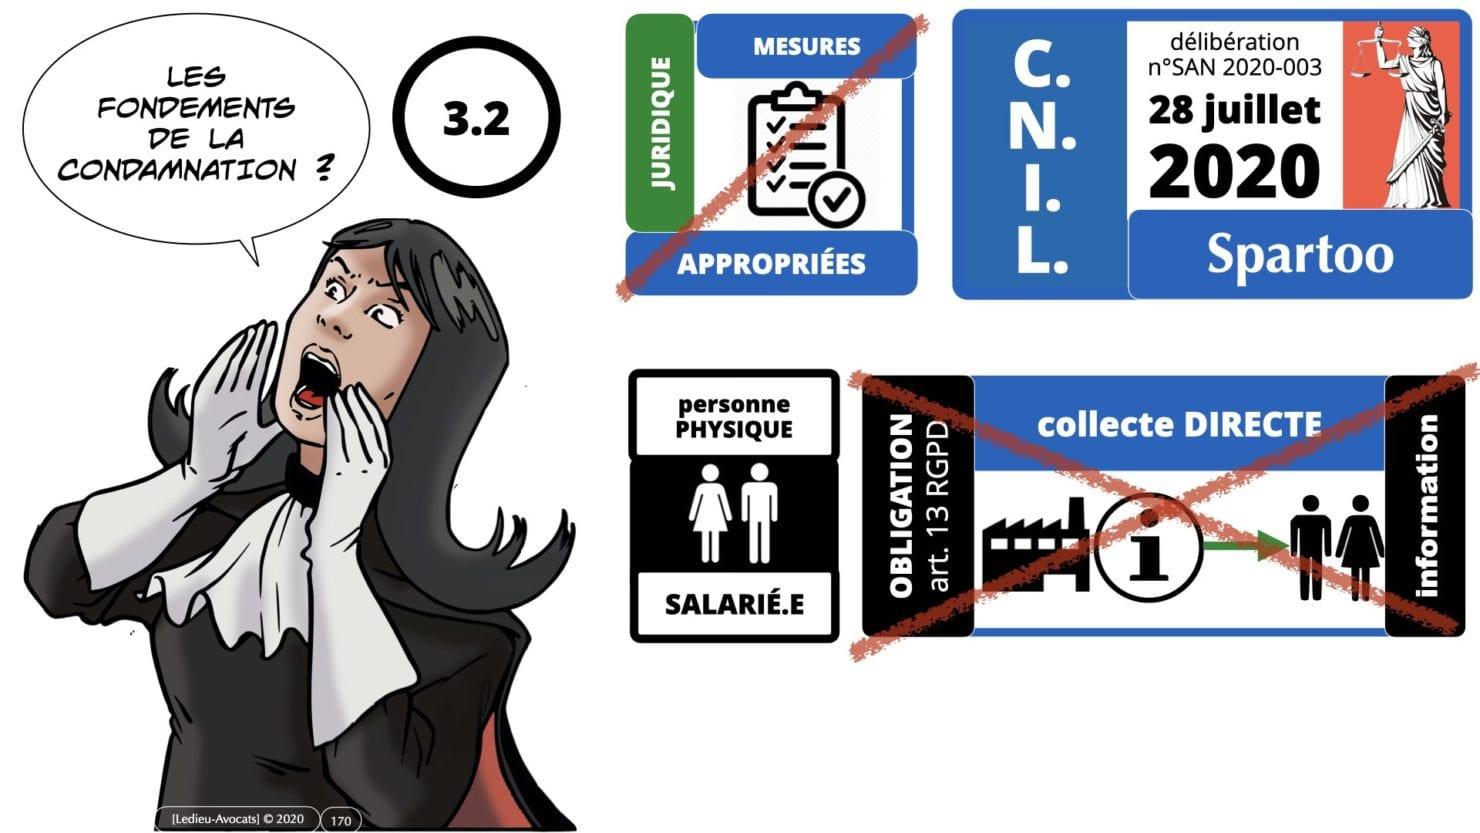 RGPD e-Privacy principes actualité jurisprudence ©Ledieu-Avocats 25-06-2021.170